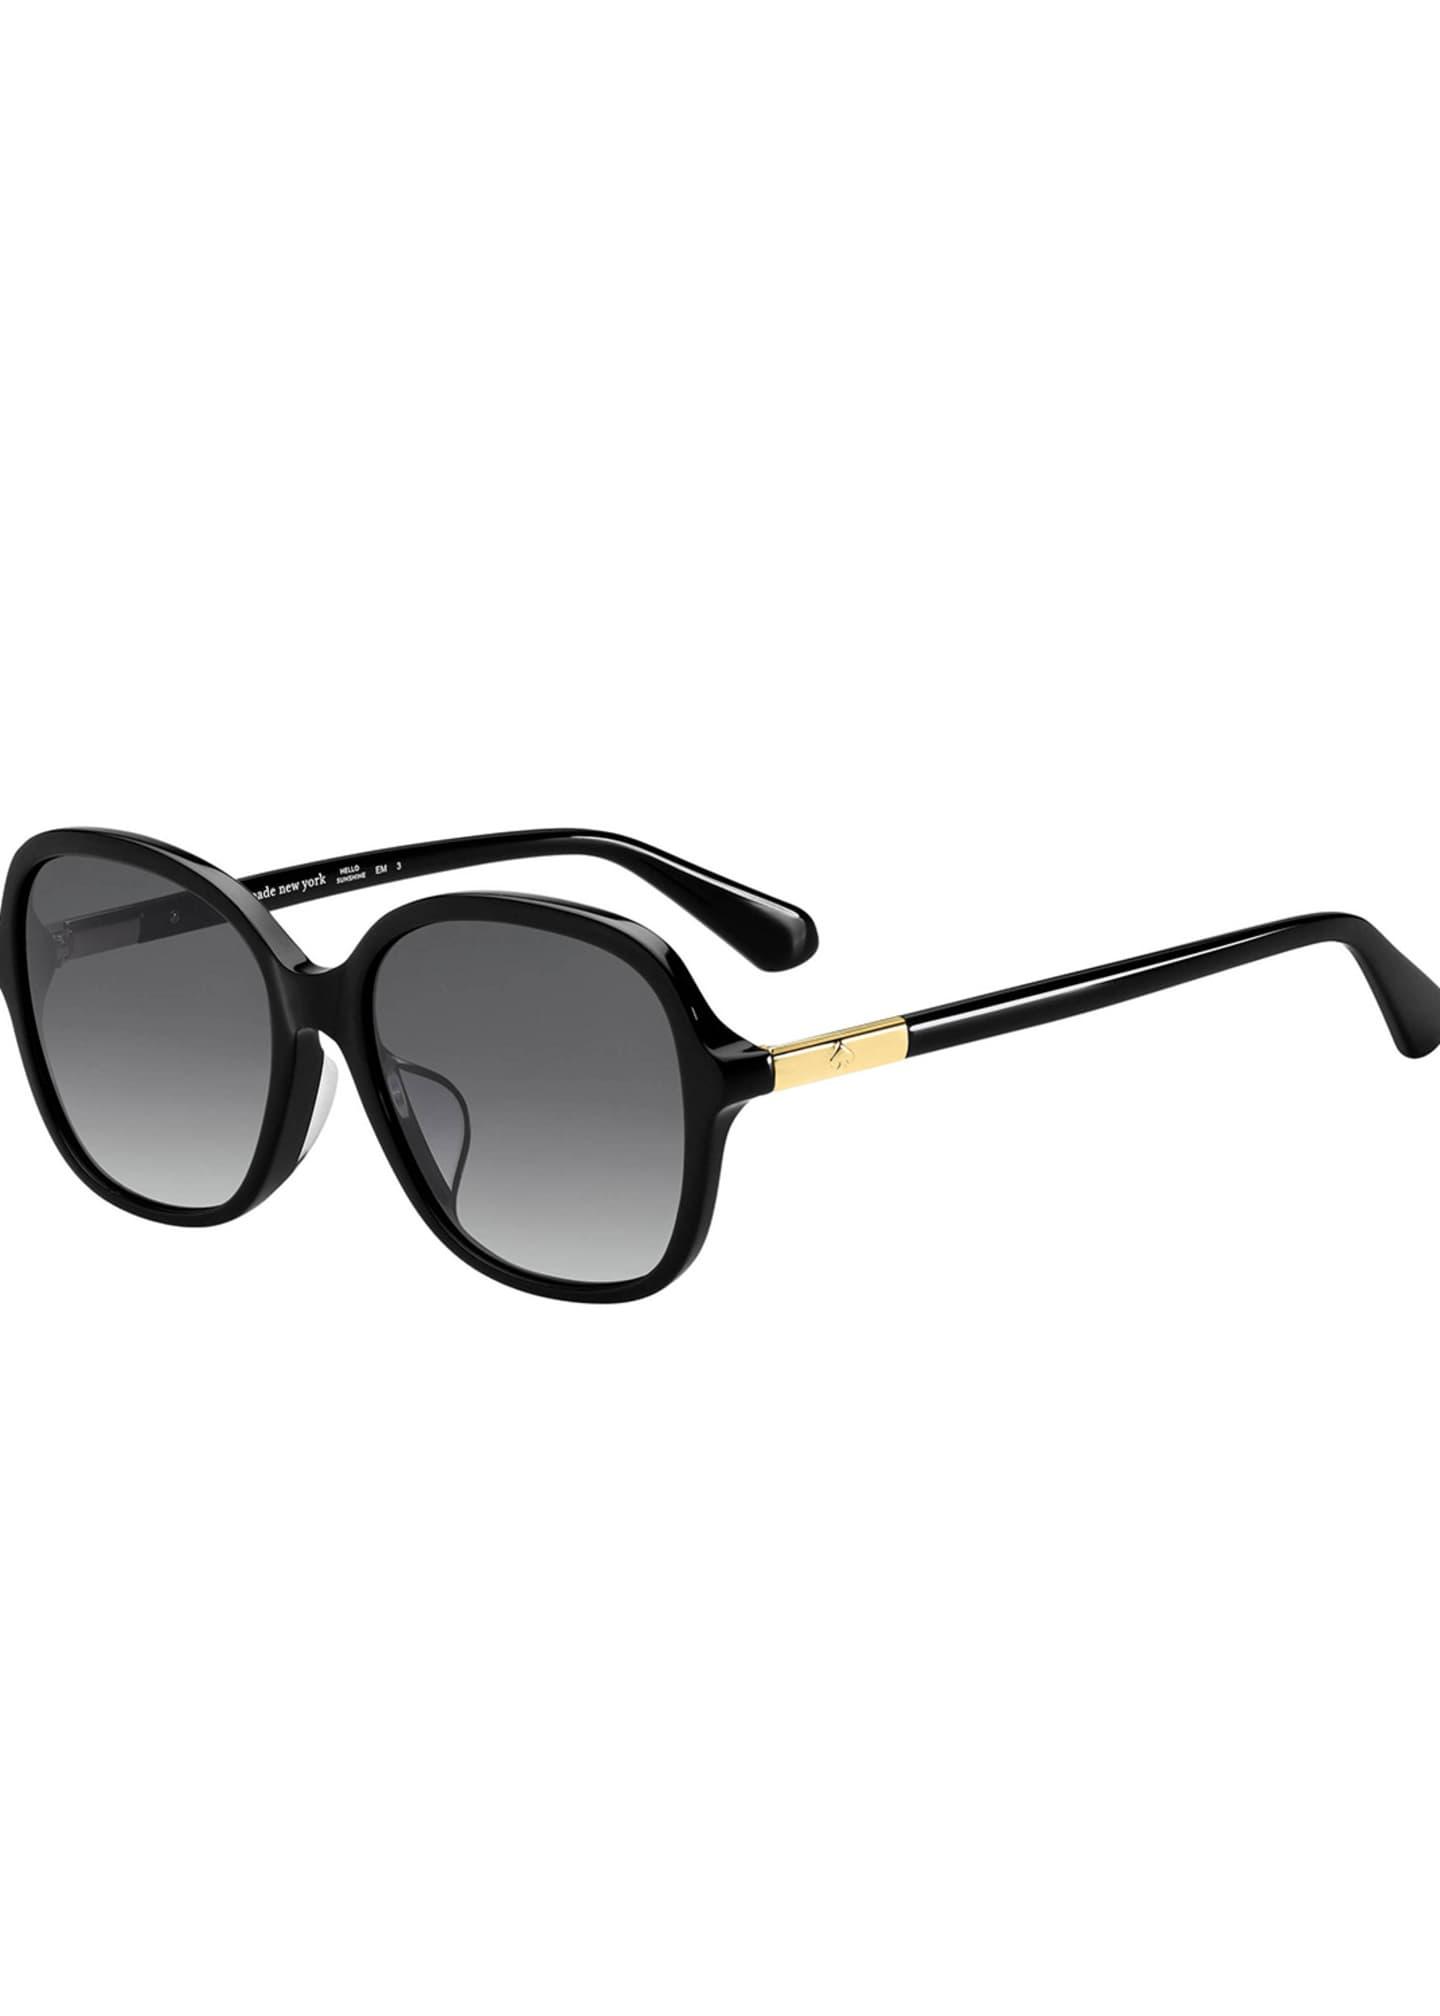 kate spade new york bryleef square acetate sunglasses